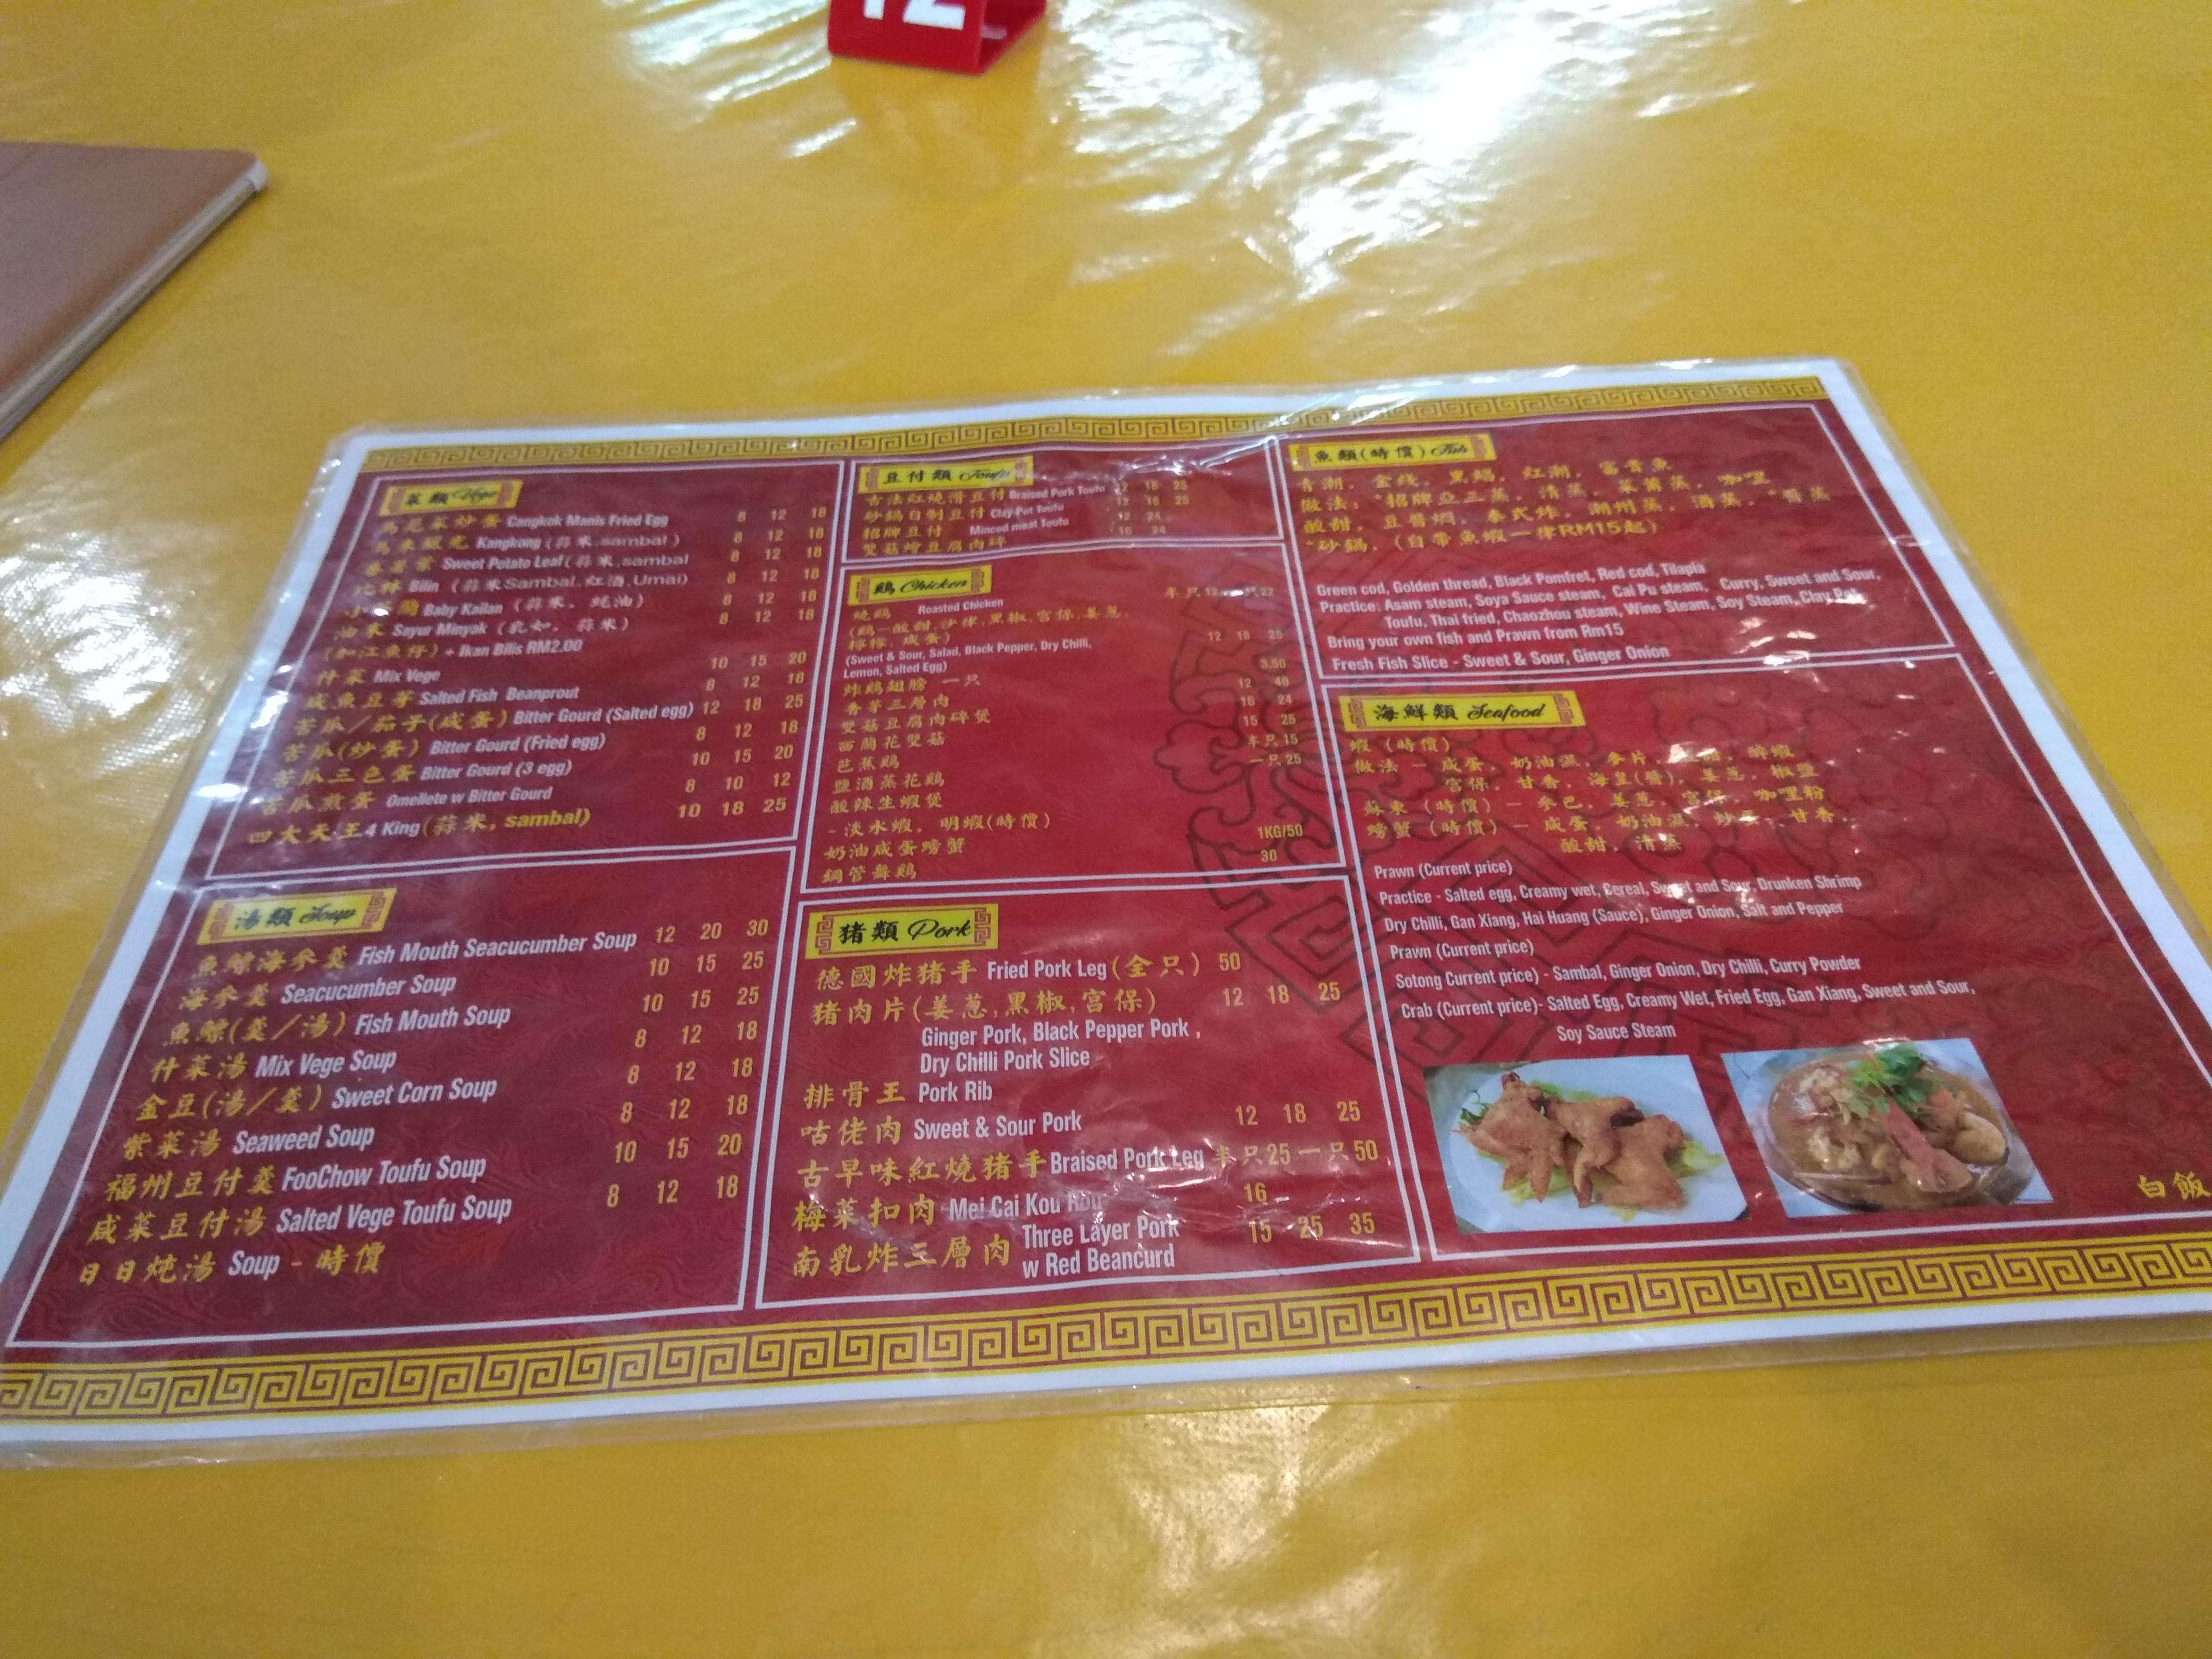 138 Cafe, Miri, Borneo, Sarawak, Malaysia